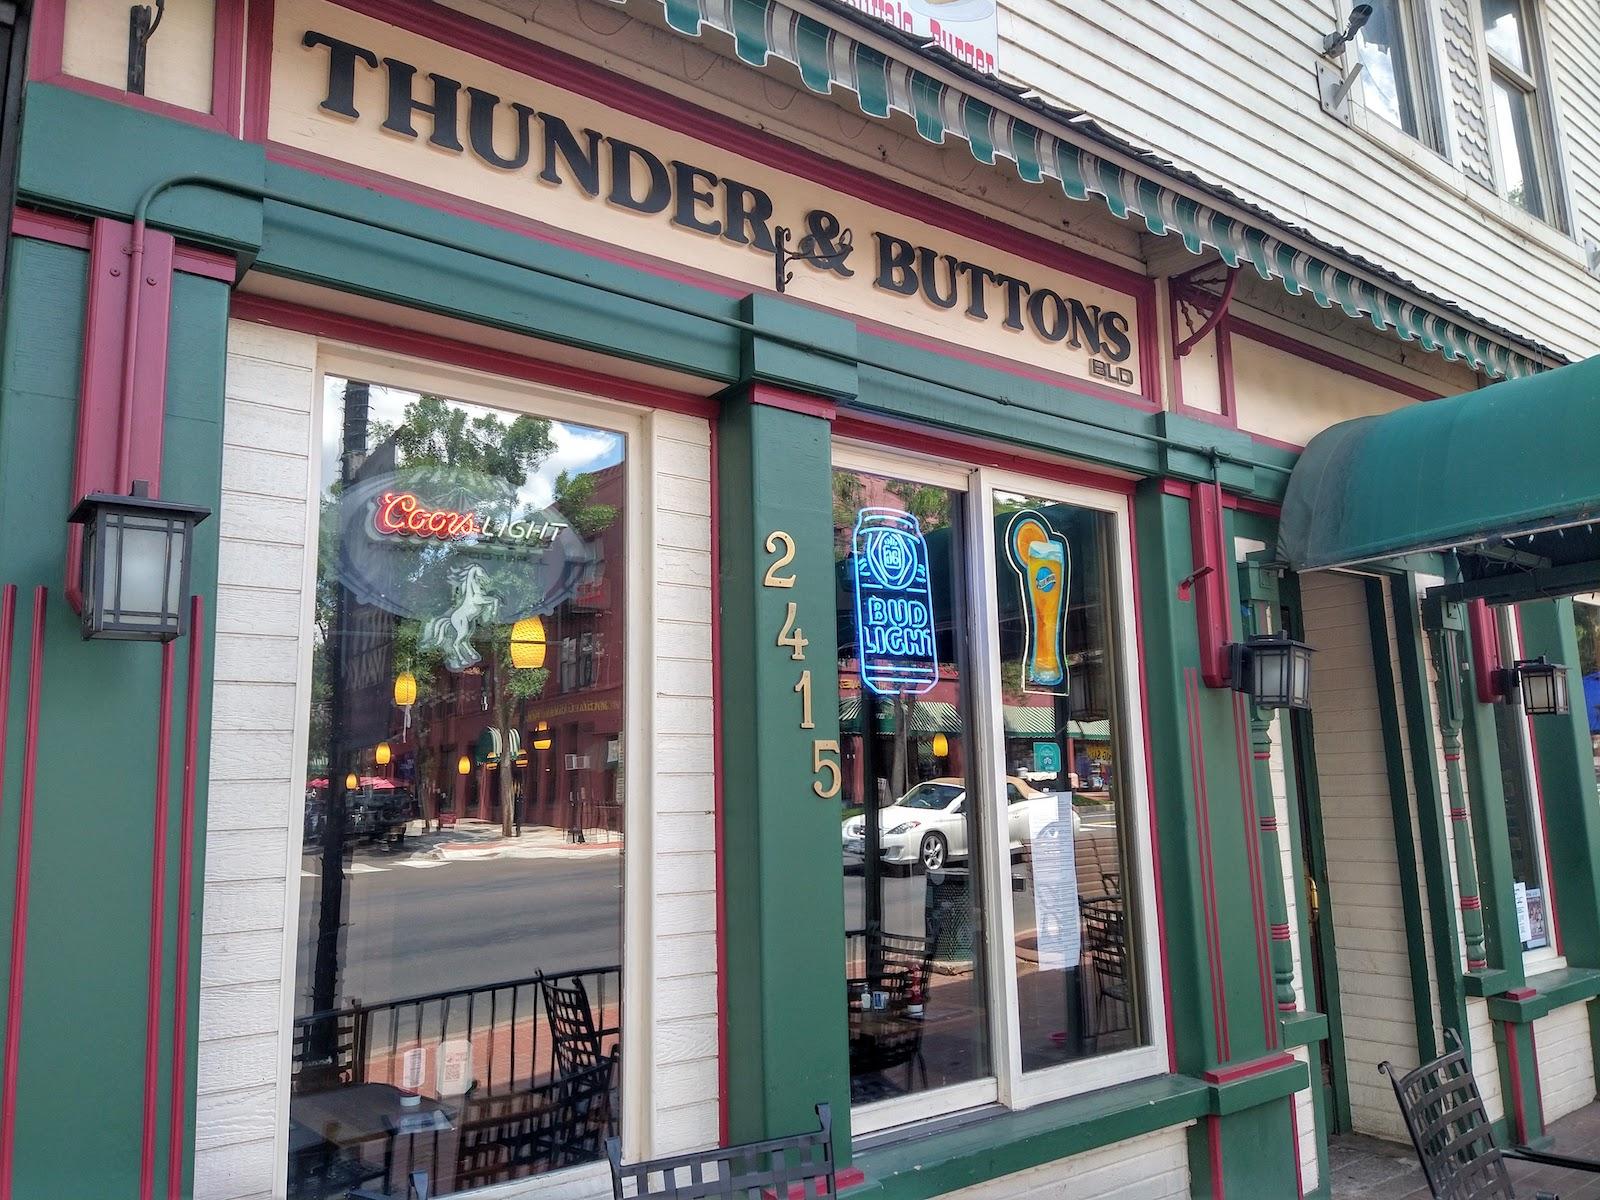 Thunder and Buttons Bar Colorado Springs